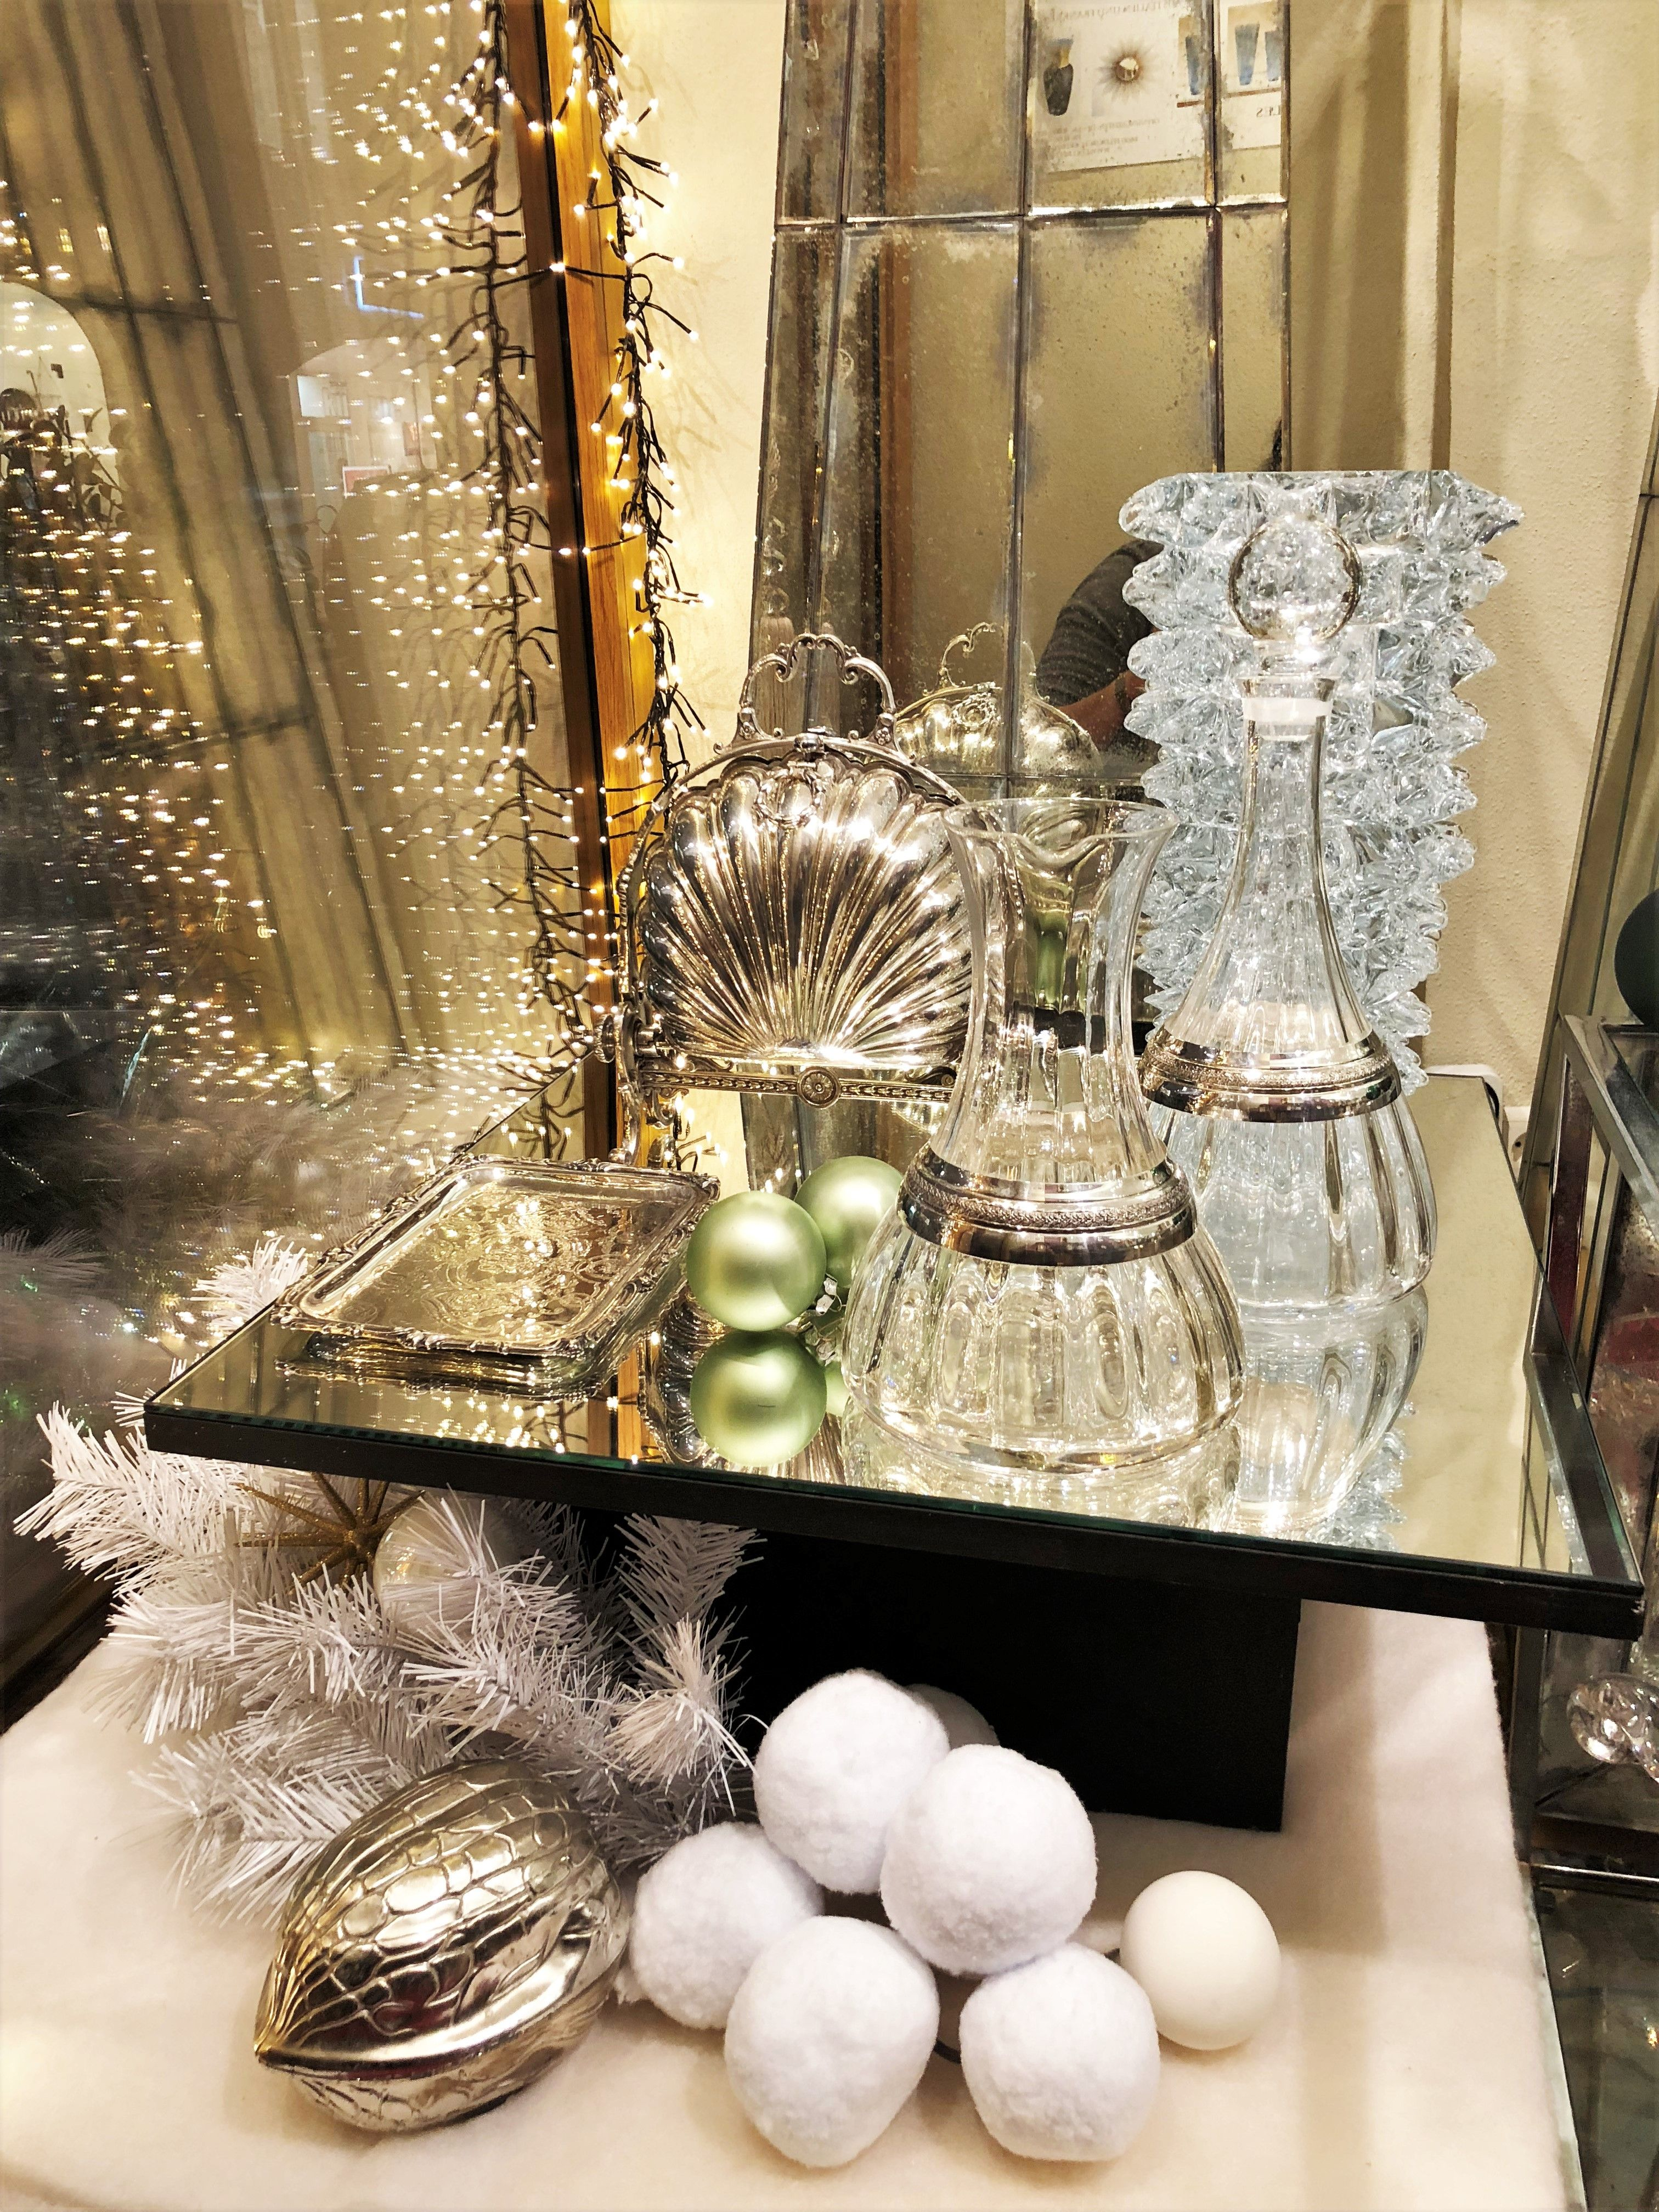 Deckenlampe Murano Stil Hängelampe Jugendstil Antik Glas Handwerkskunst Edel NEU